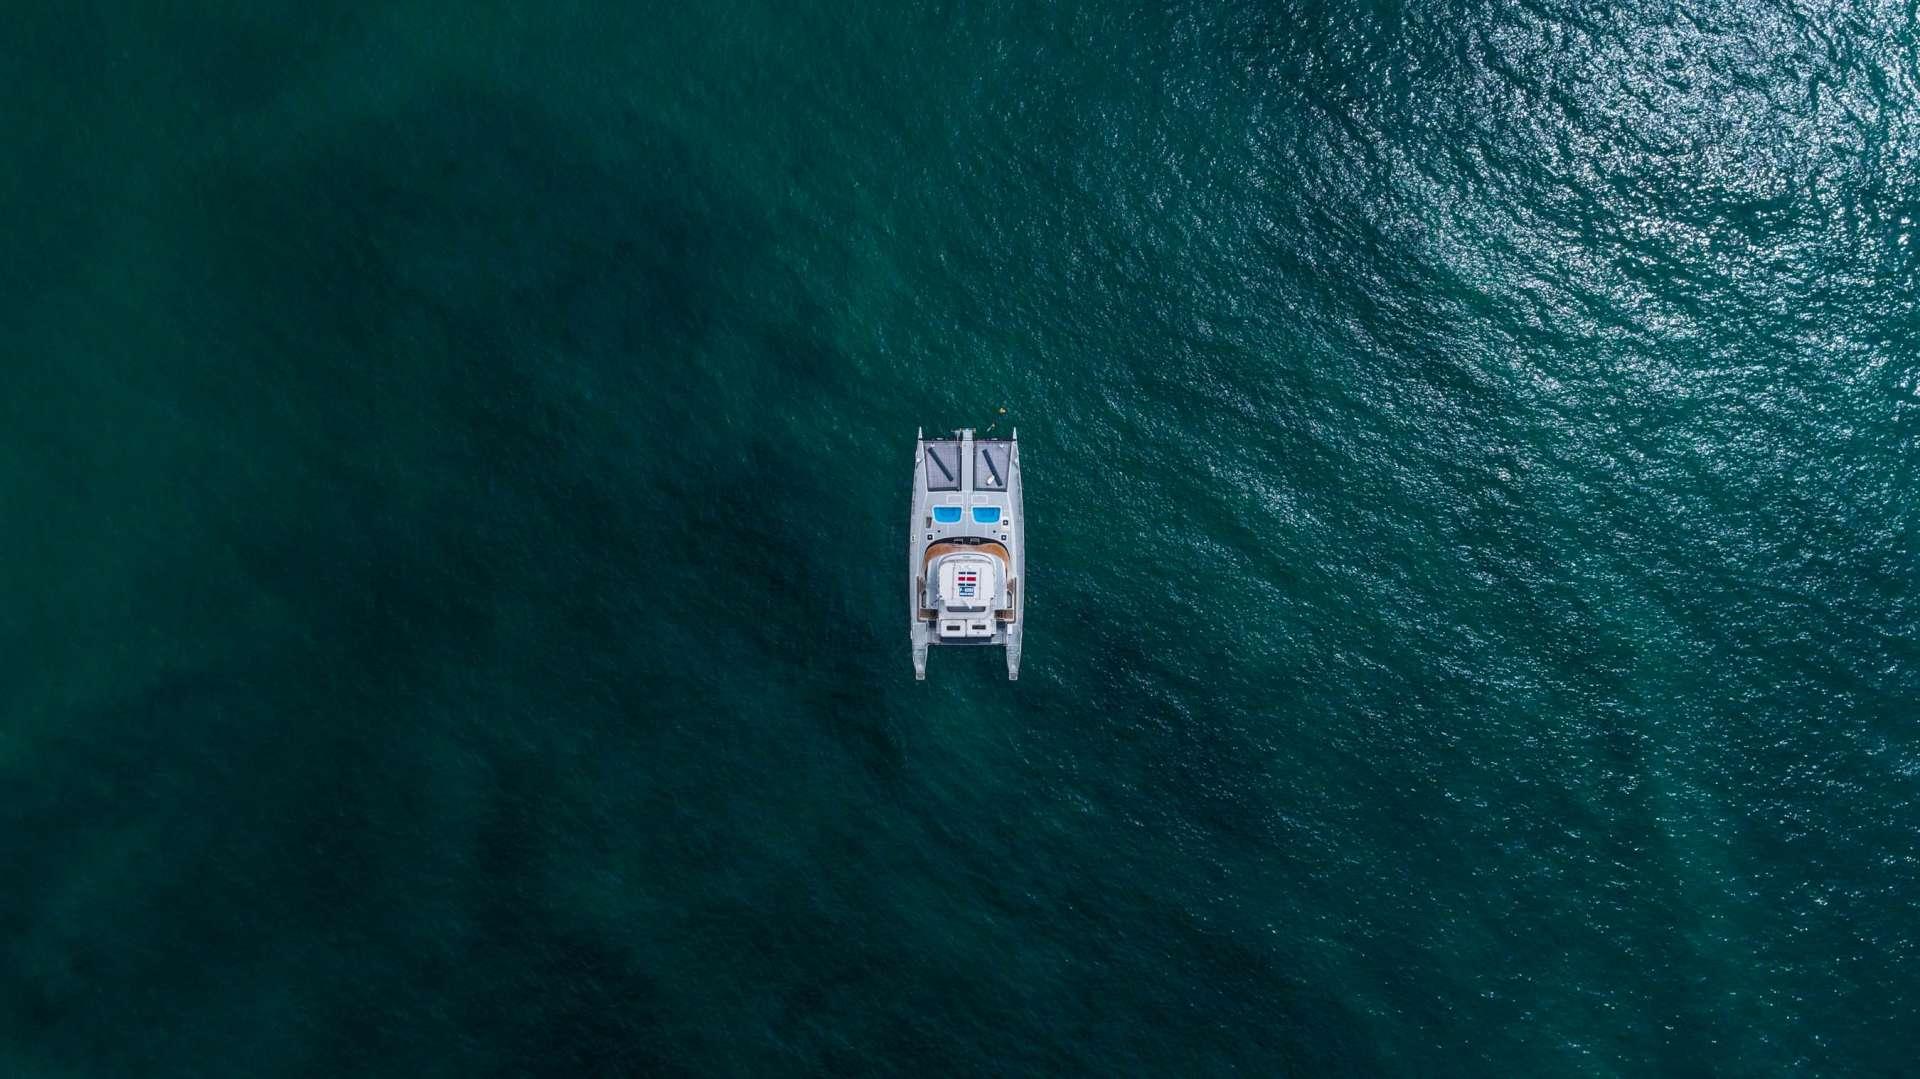 Island Tortuga Costa Rica From Above Enrico Pescantini calypso cruises